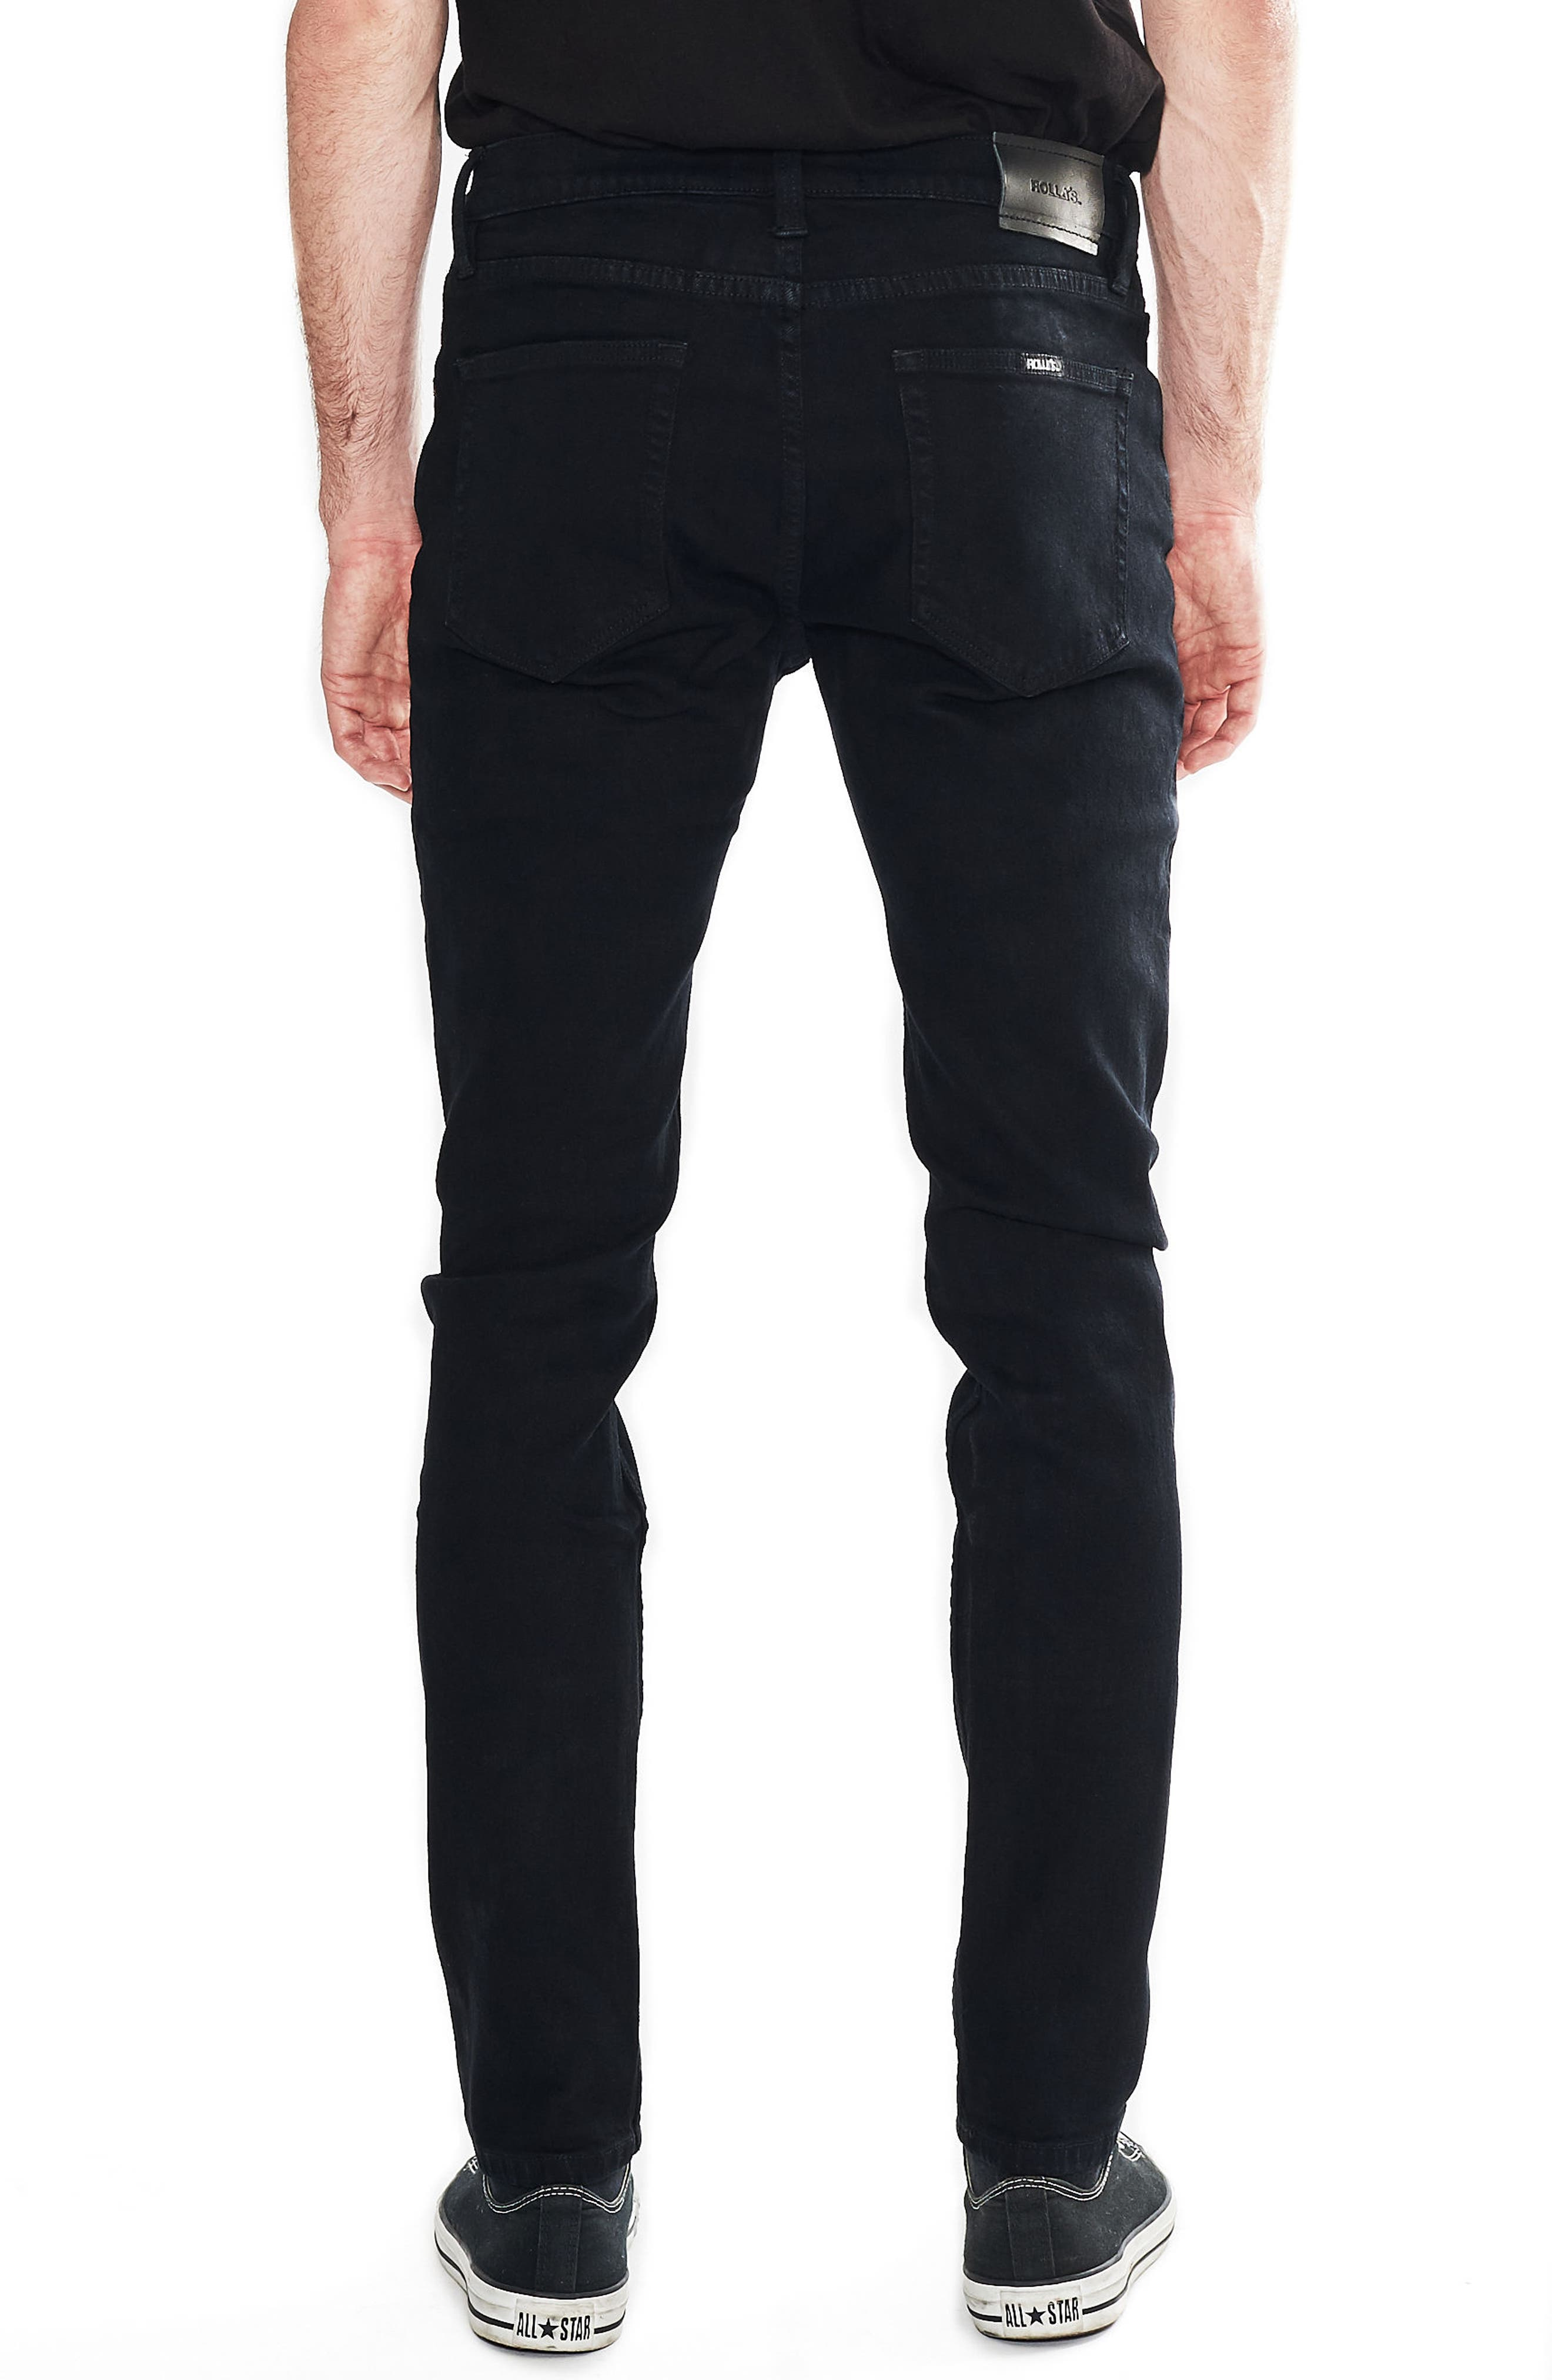 Thin Captain Slim Fit Jeans,                             Alternate thumbnail 2, color,                             BON BLACK